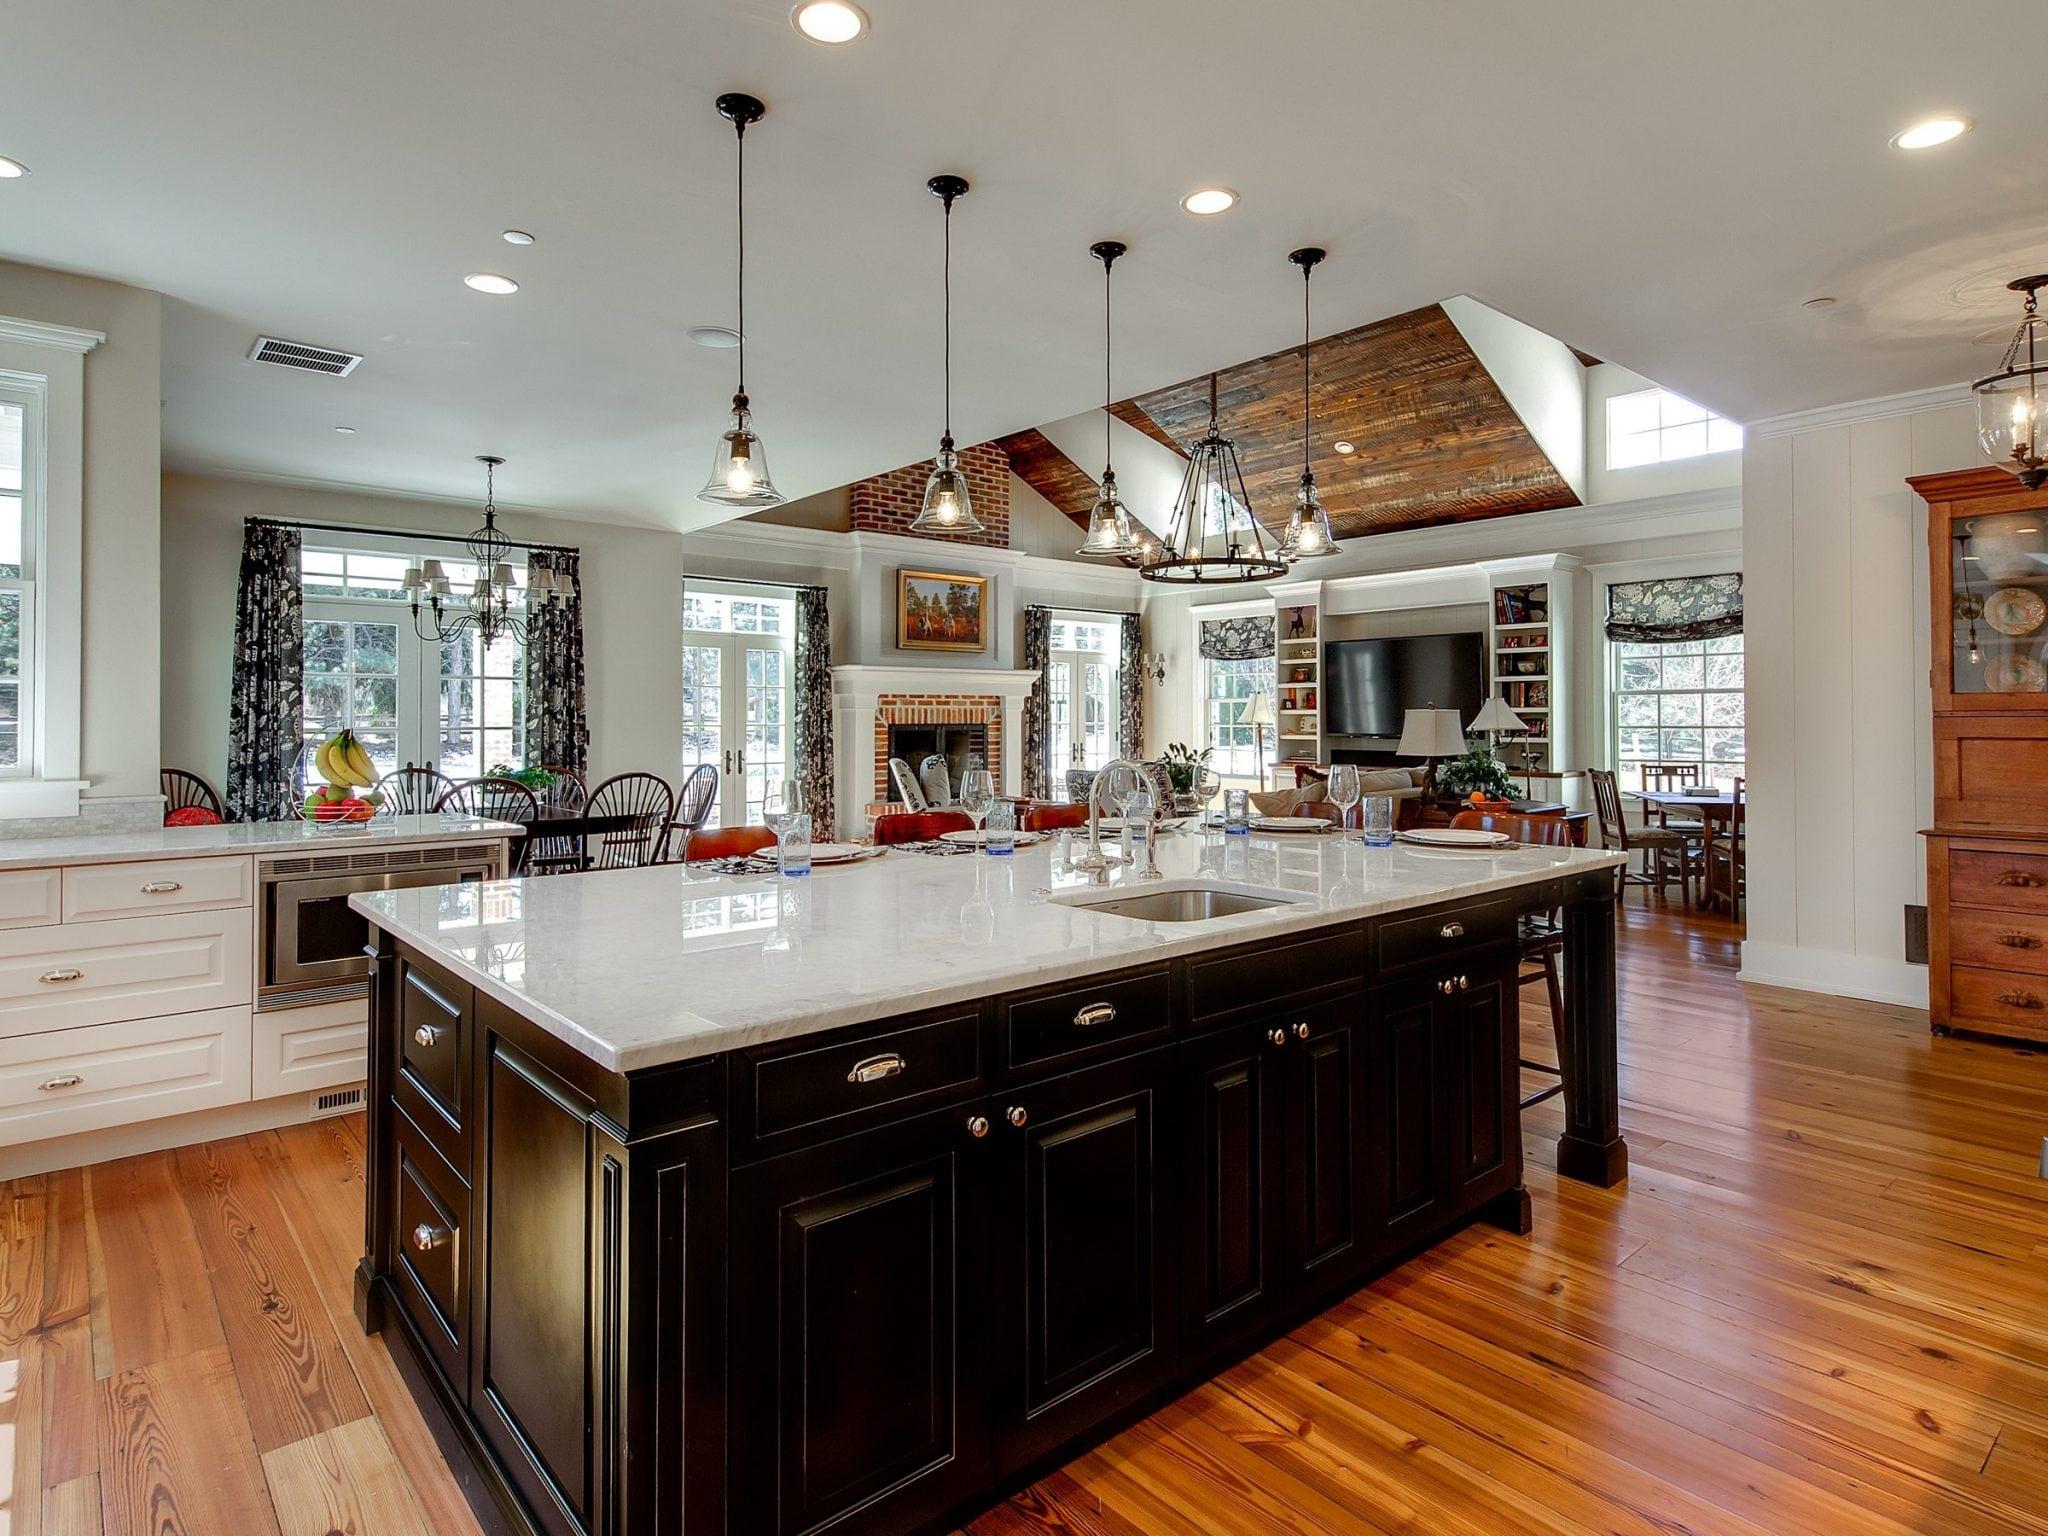 bright modern kitchen with white countertops